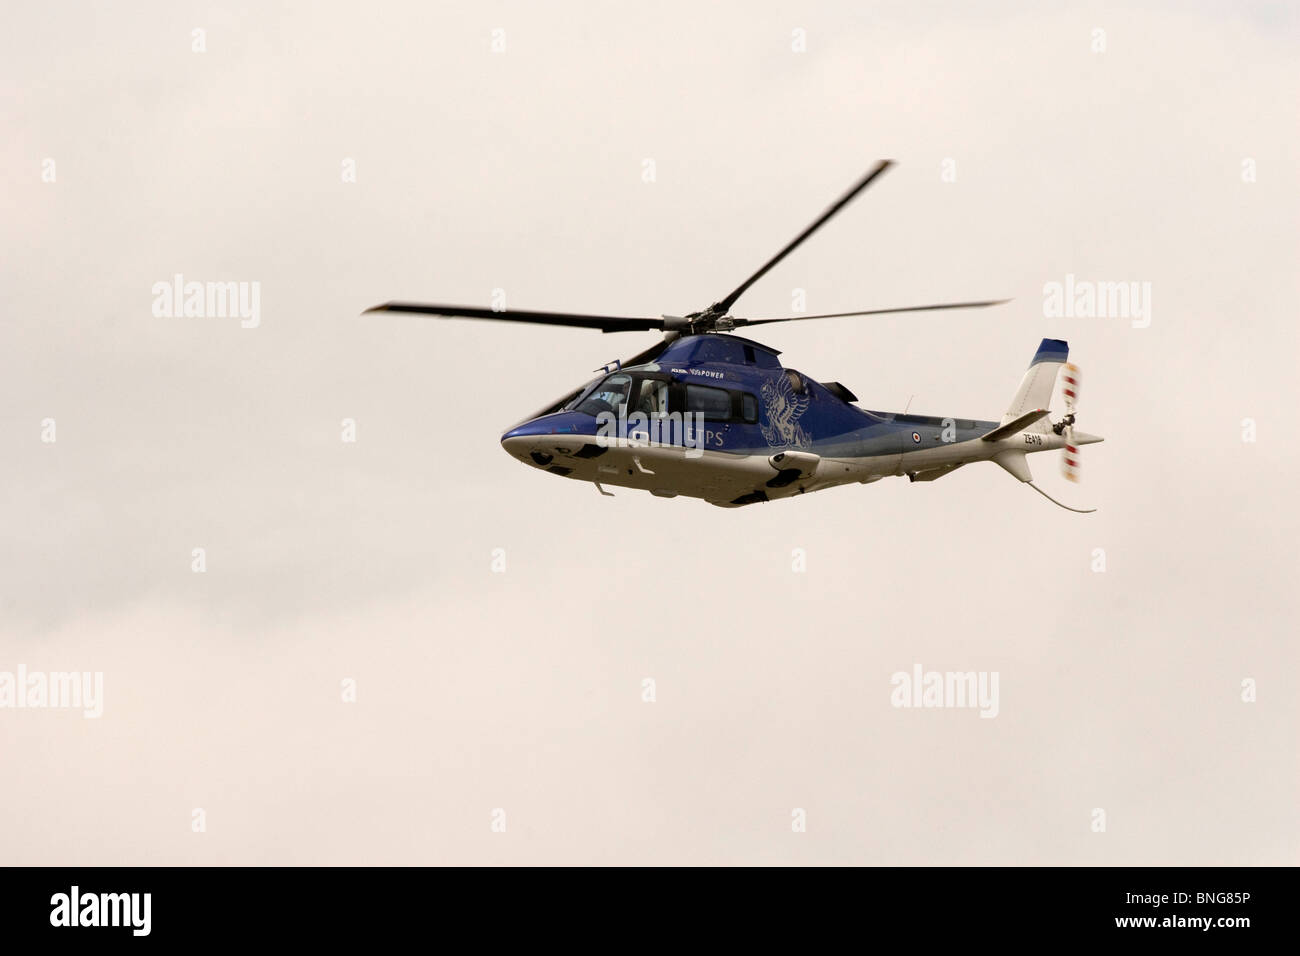 QinetiQ Agusta A109 Helicopter at Royal International Air Tattoo RIAT 2010 Air Show Fairford - Stock Image